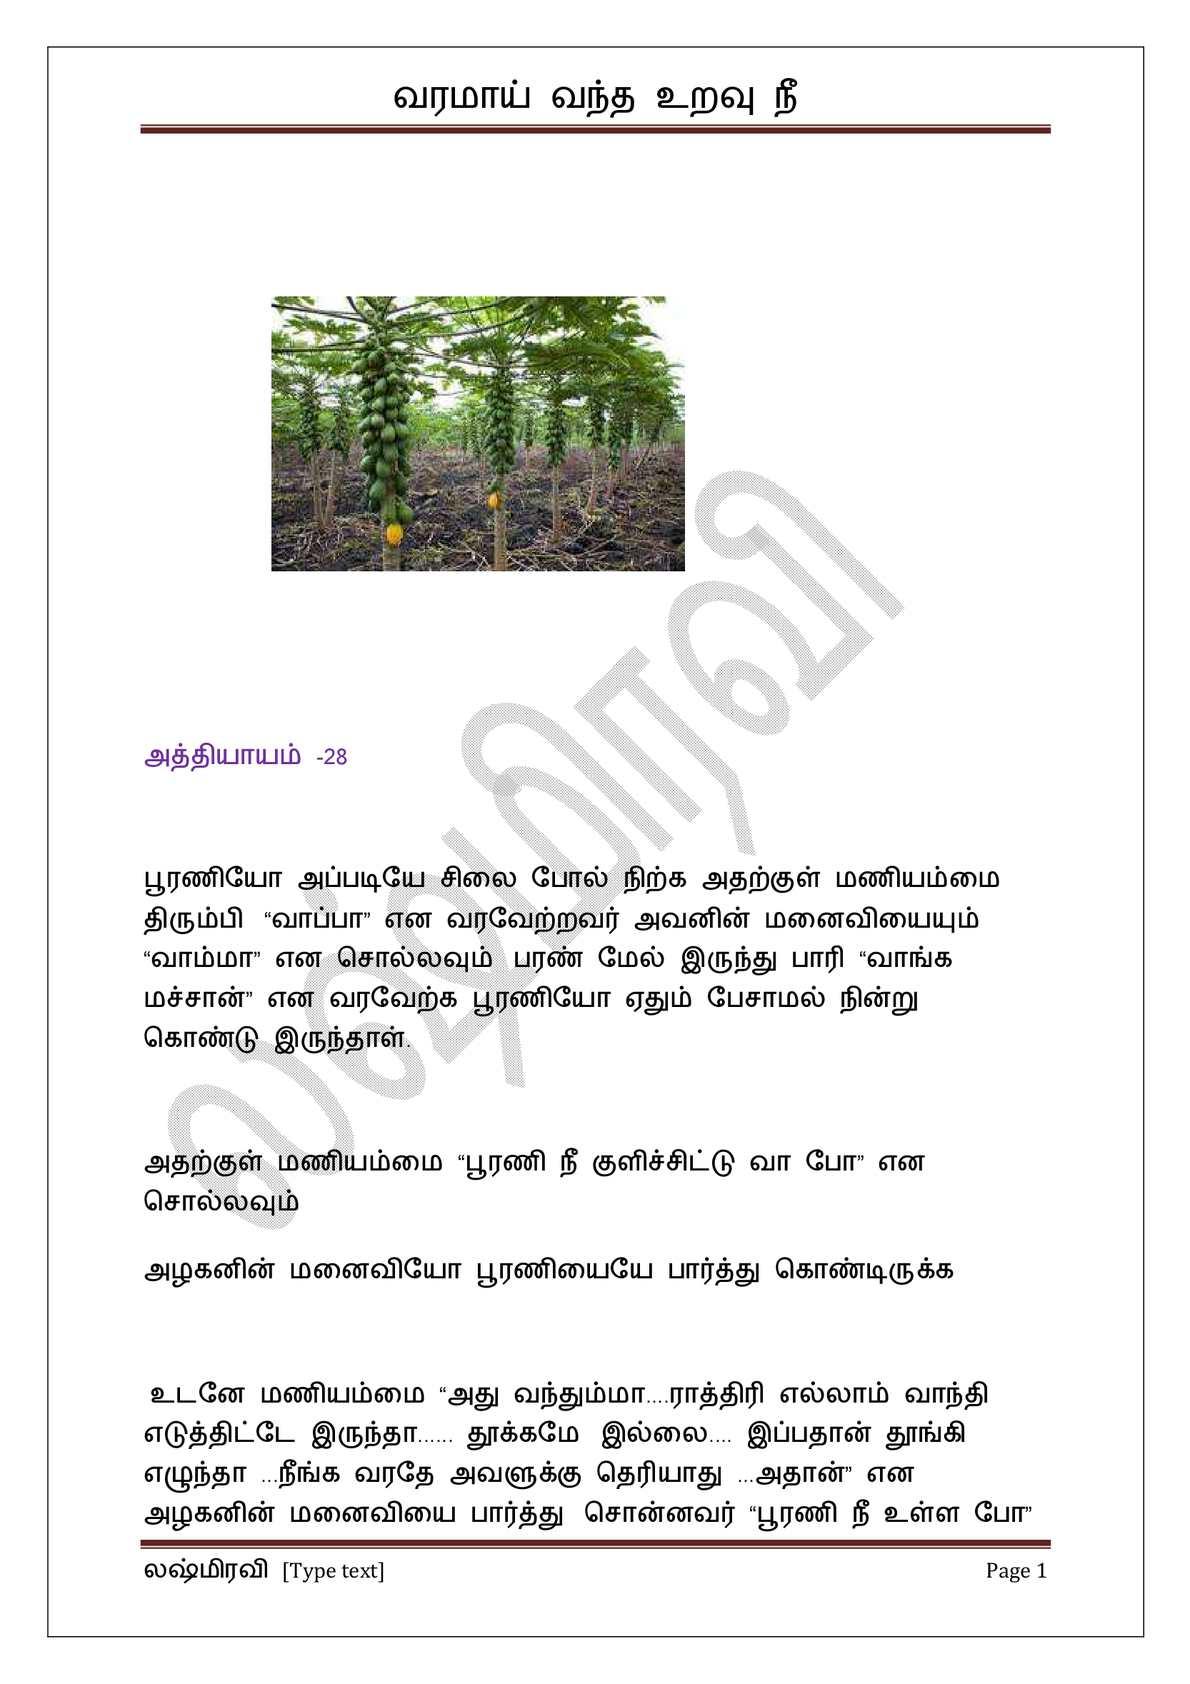 Varamaai Vantha Uravu Nee 28